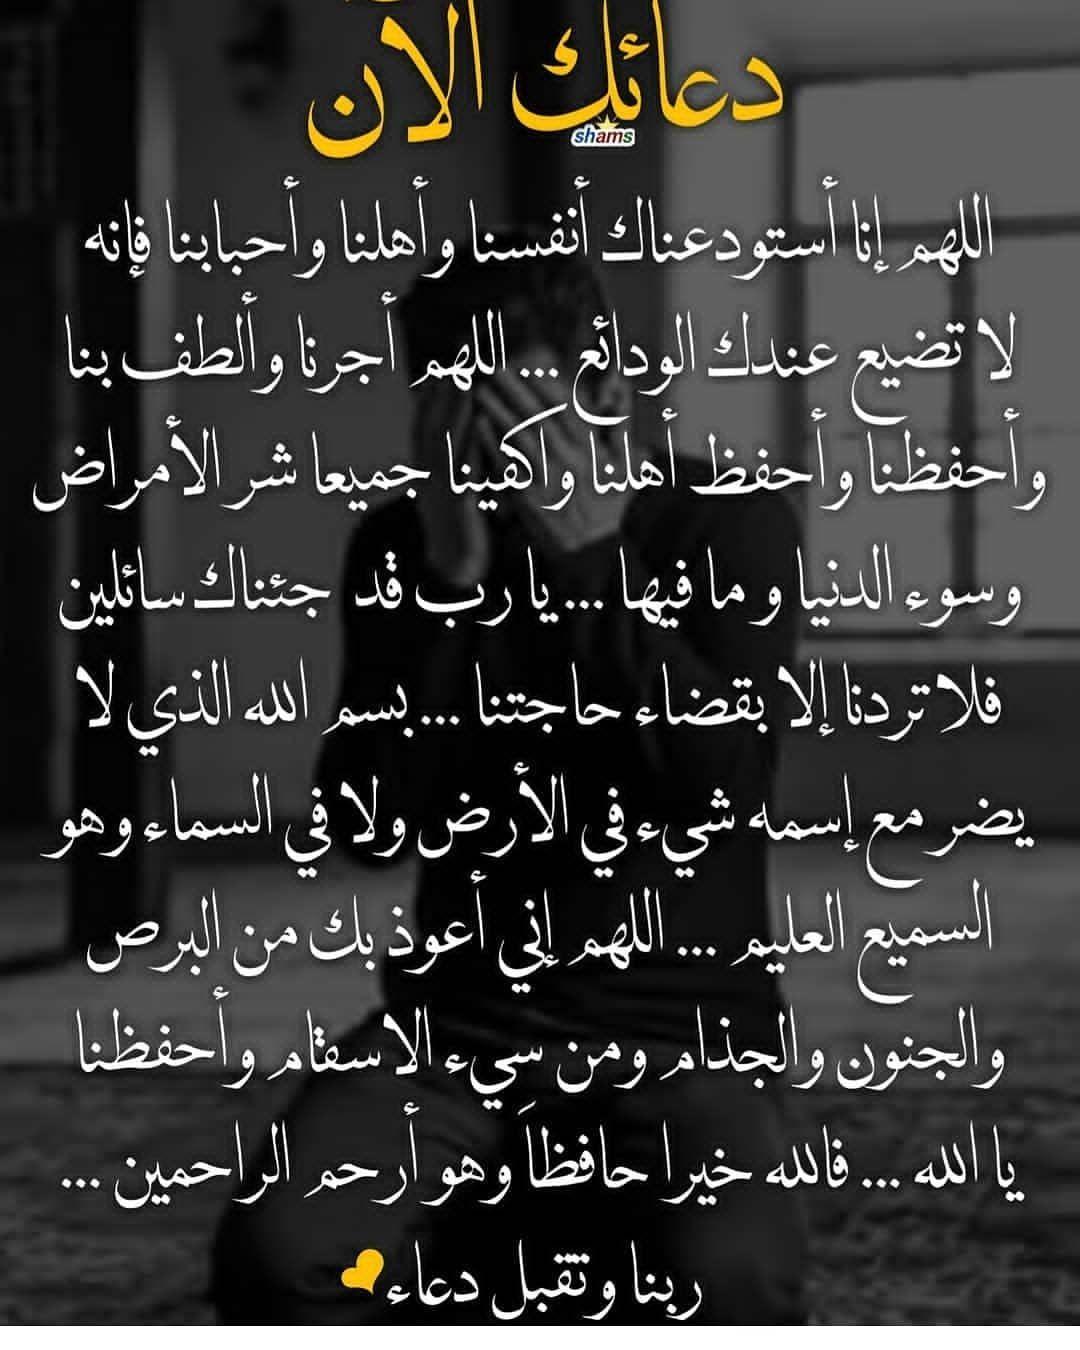 580 Likes 36 Comments دعاء يقين أمل ثقة بالله سعادة Nadm Magz On Instagram آميين يااارب Cool Words Quran Quotes Romantic Love Quotes